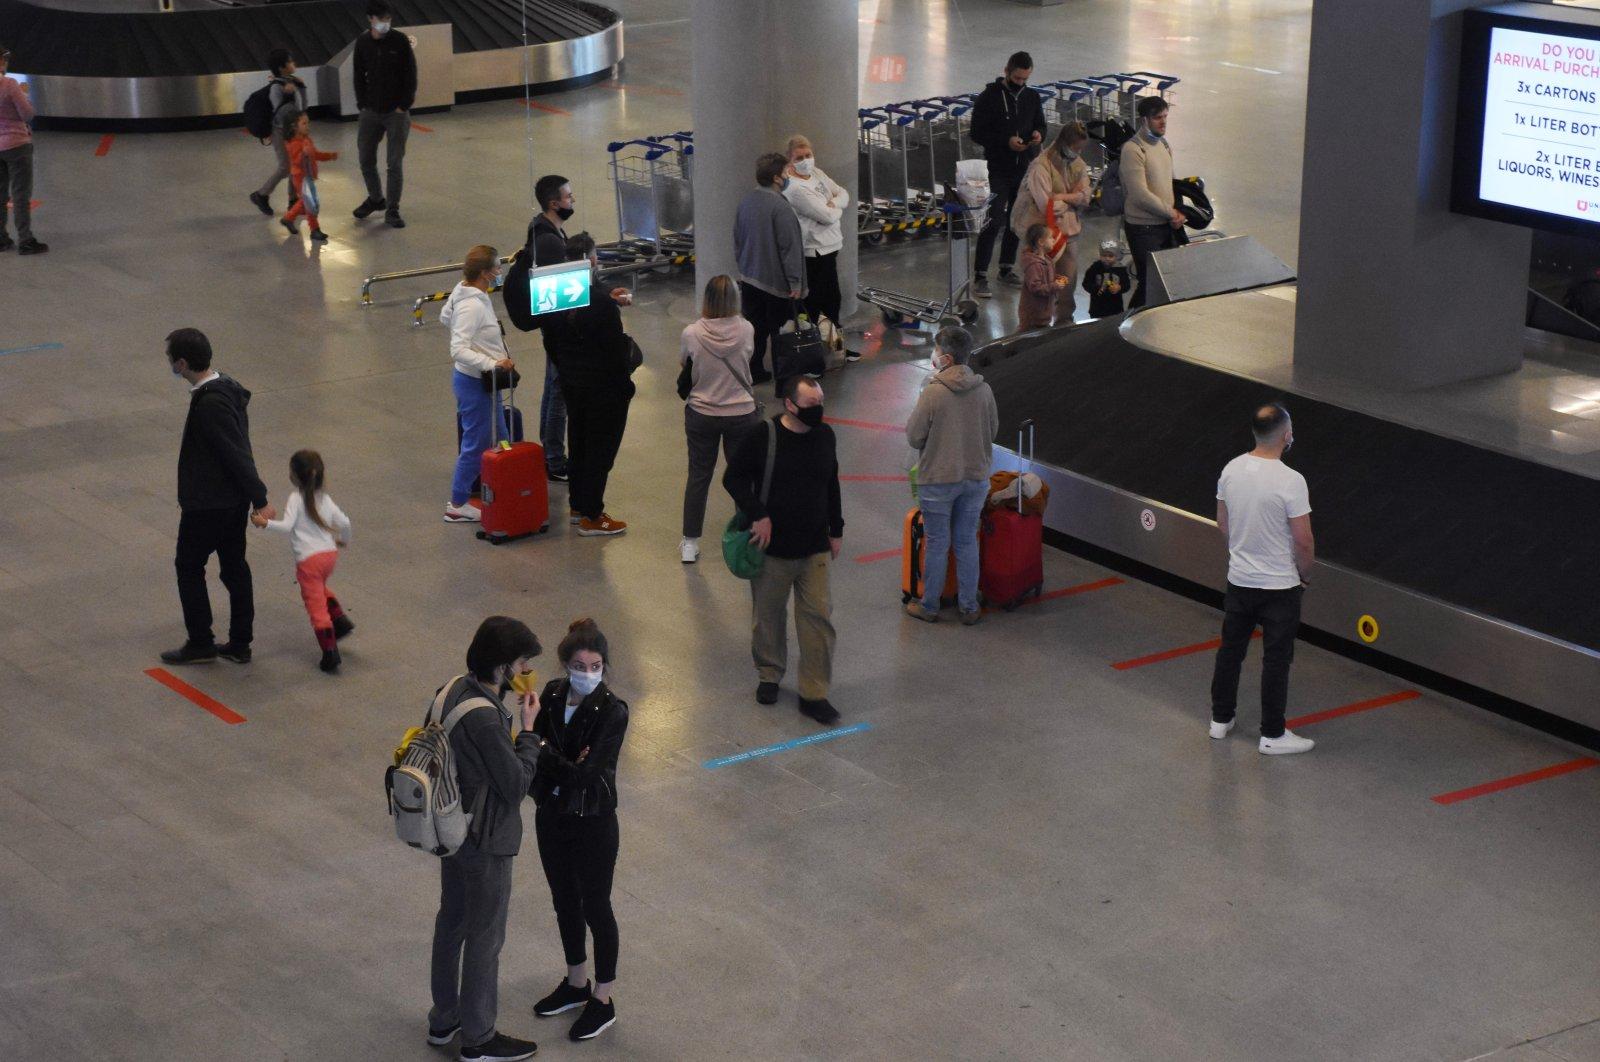 Tourists from the first plane of the season walk in Dalaman Airport, Muğla, southwestern Turkey, March 19, 2021. (AA Photo)